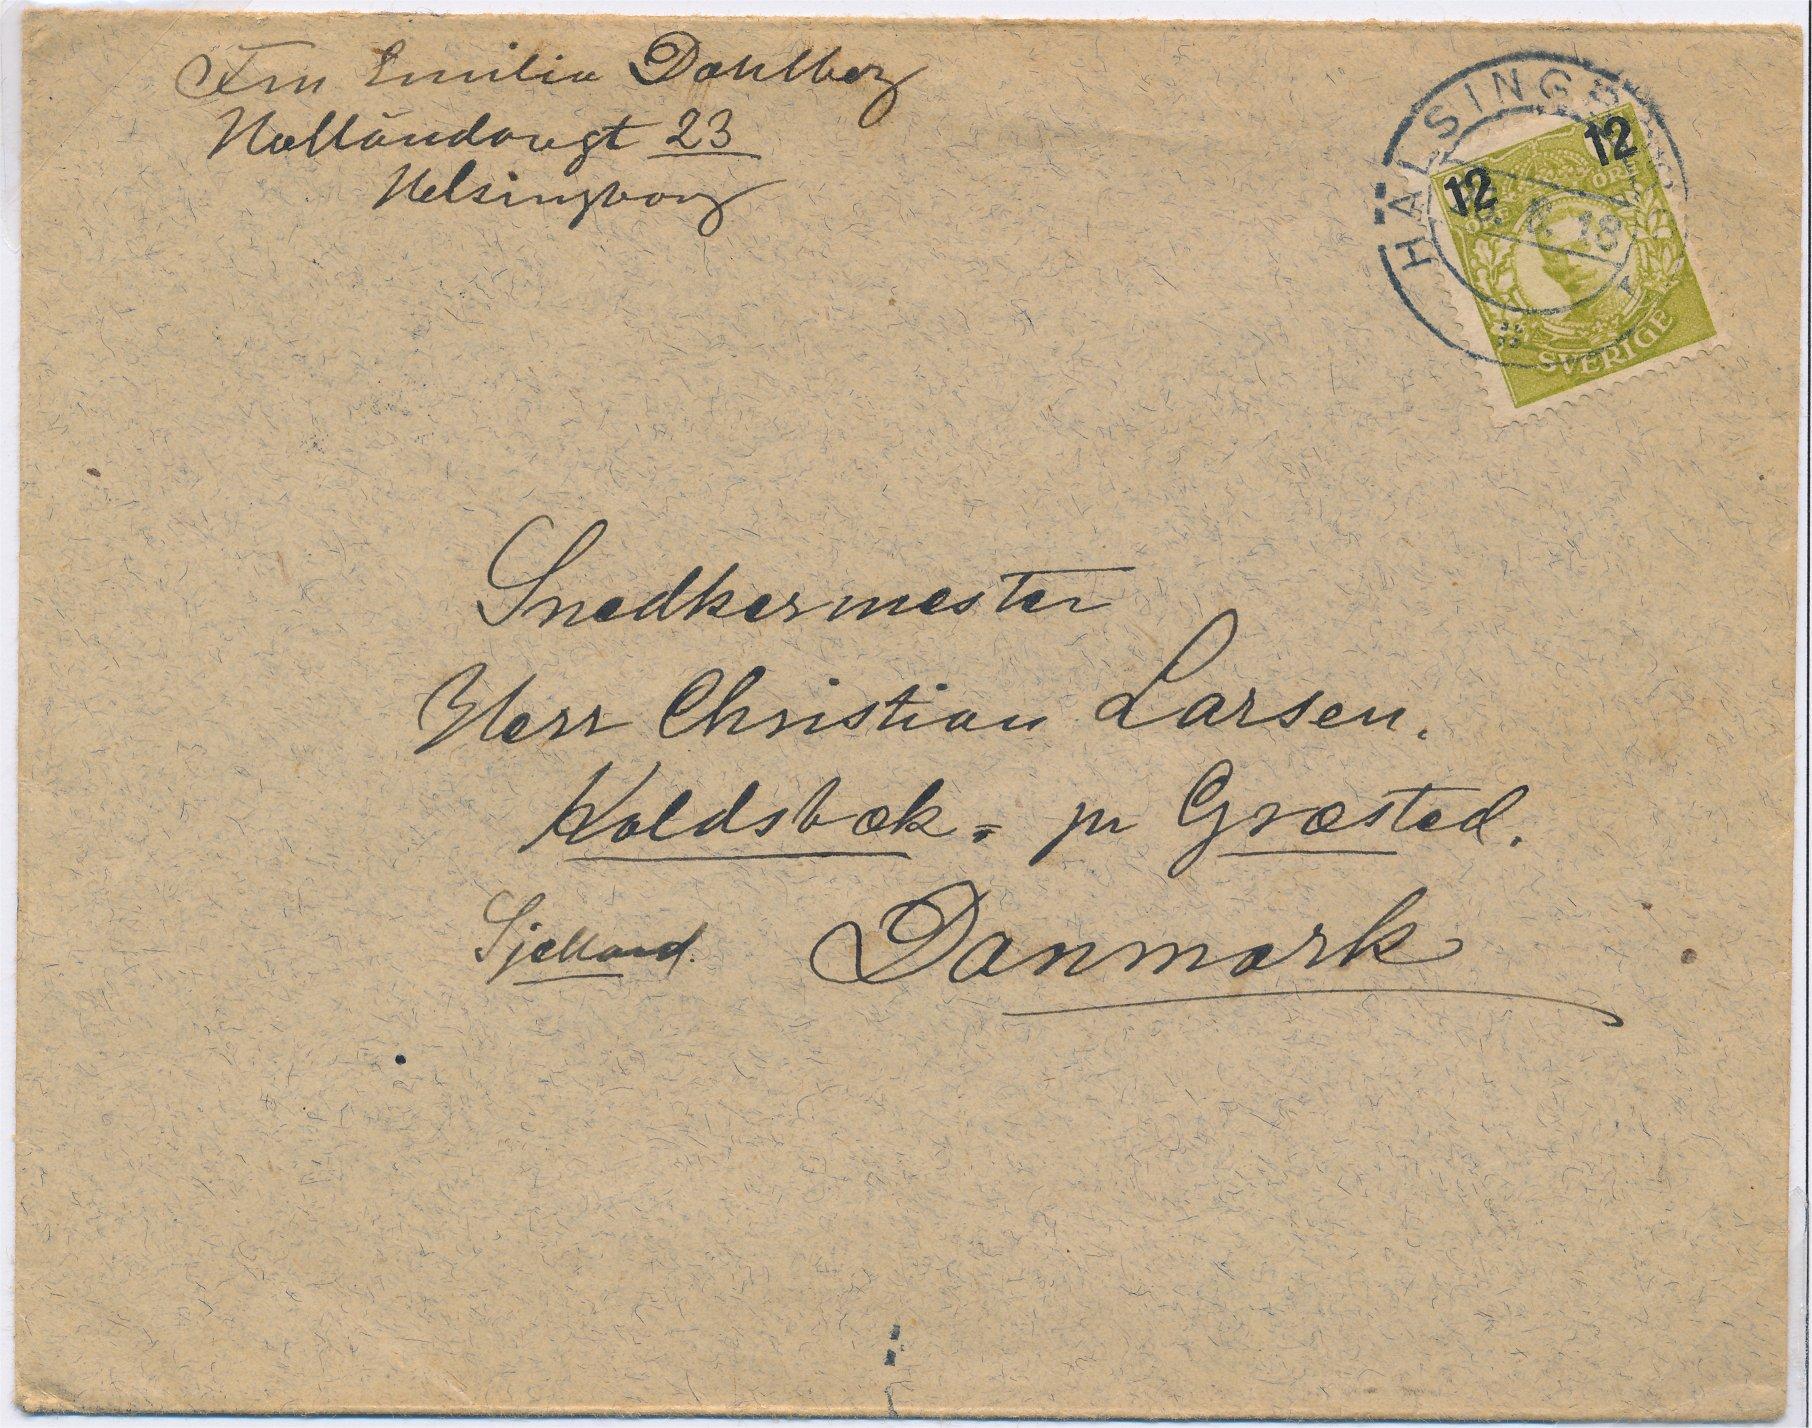 12_halsingborg_25_6_1918